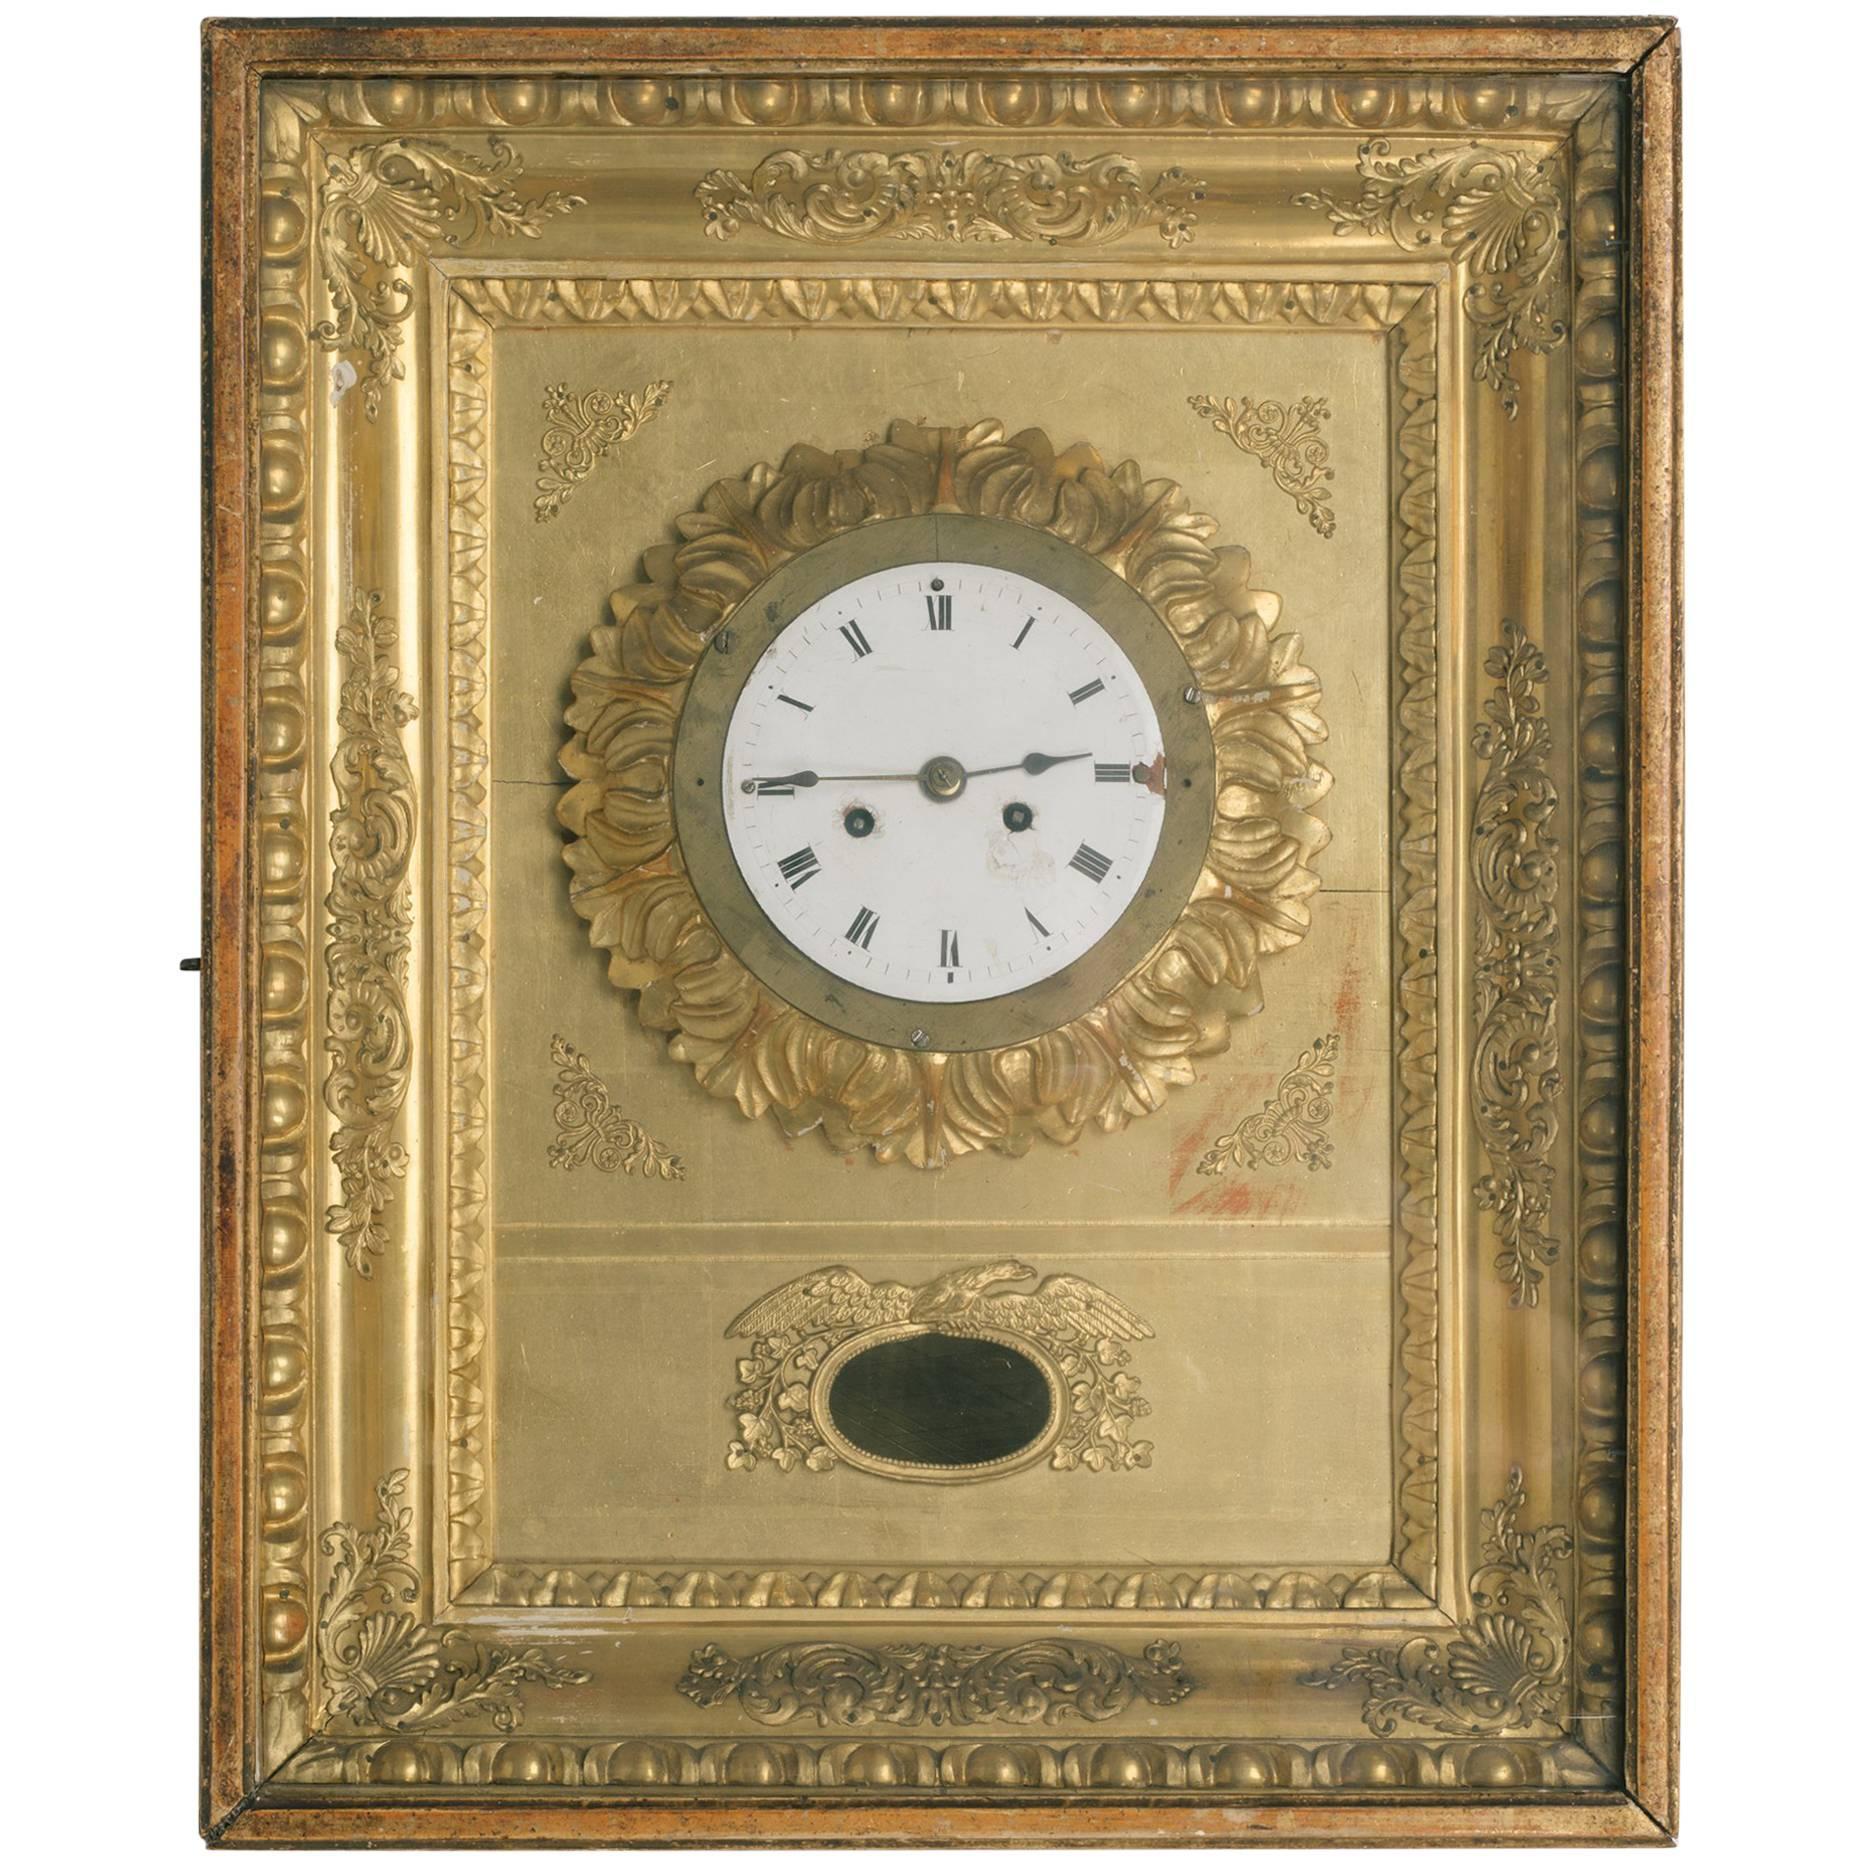 19th Century French Gilt Wall Clock